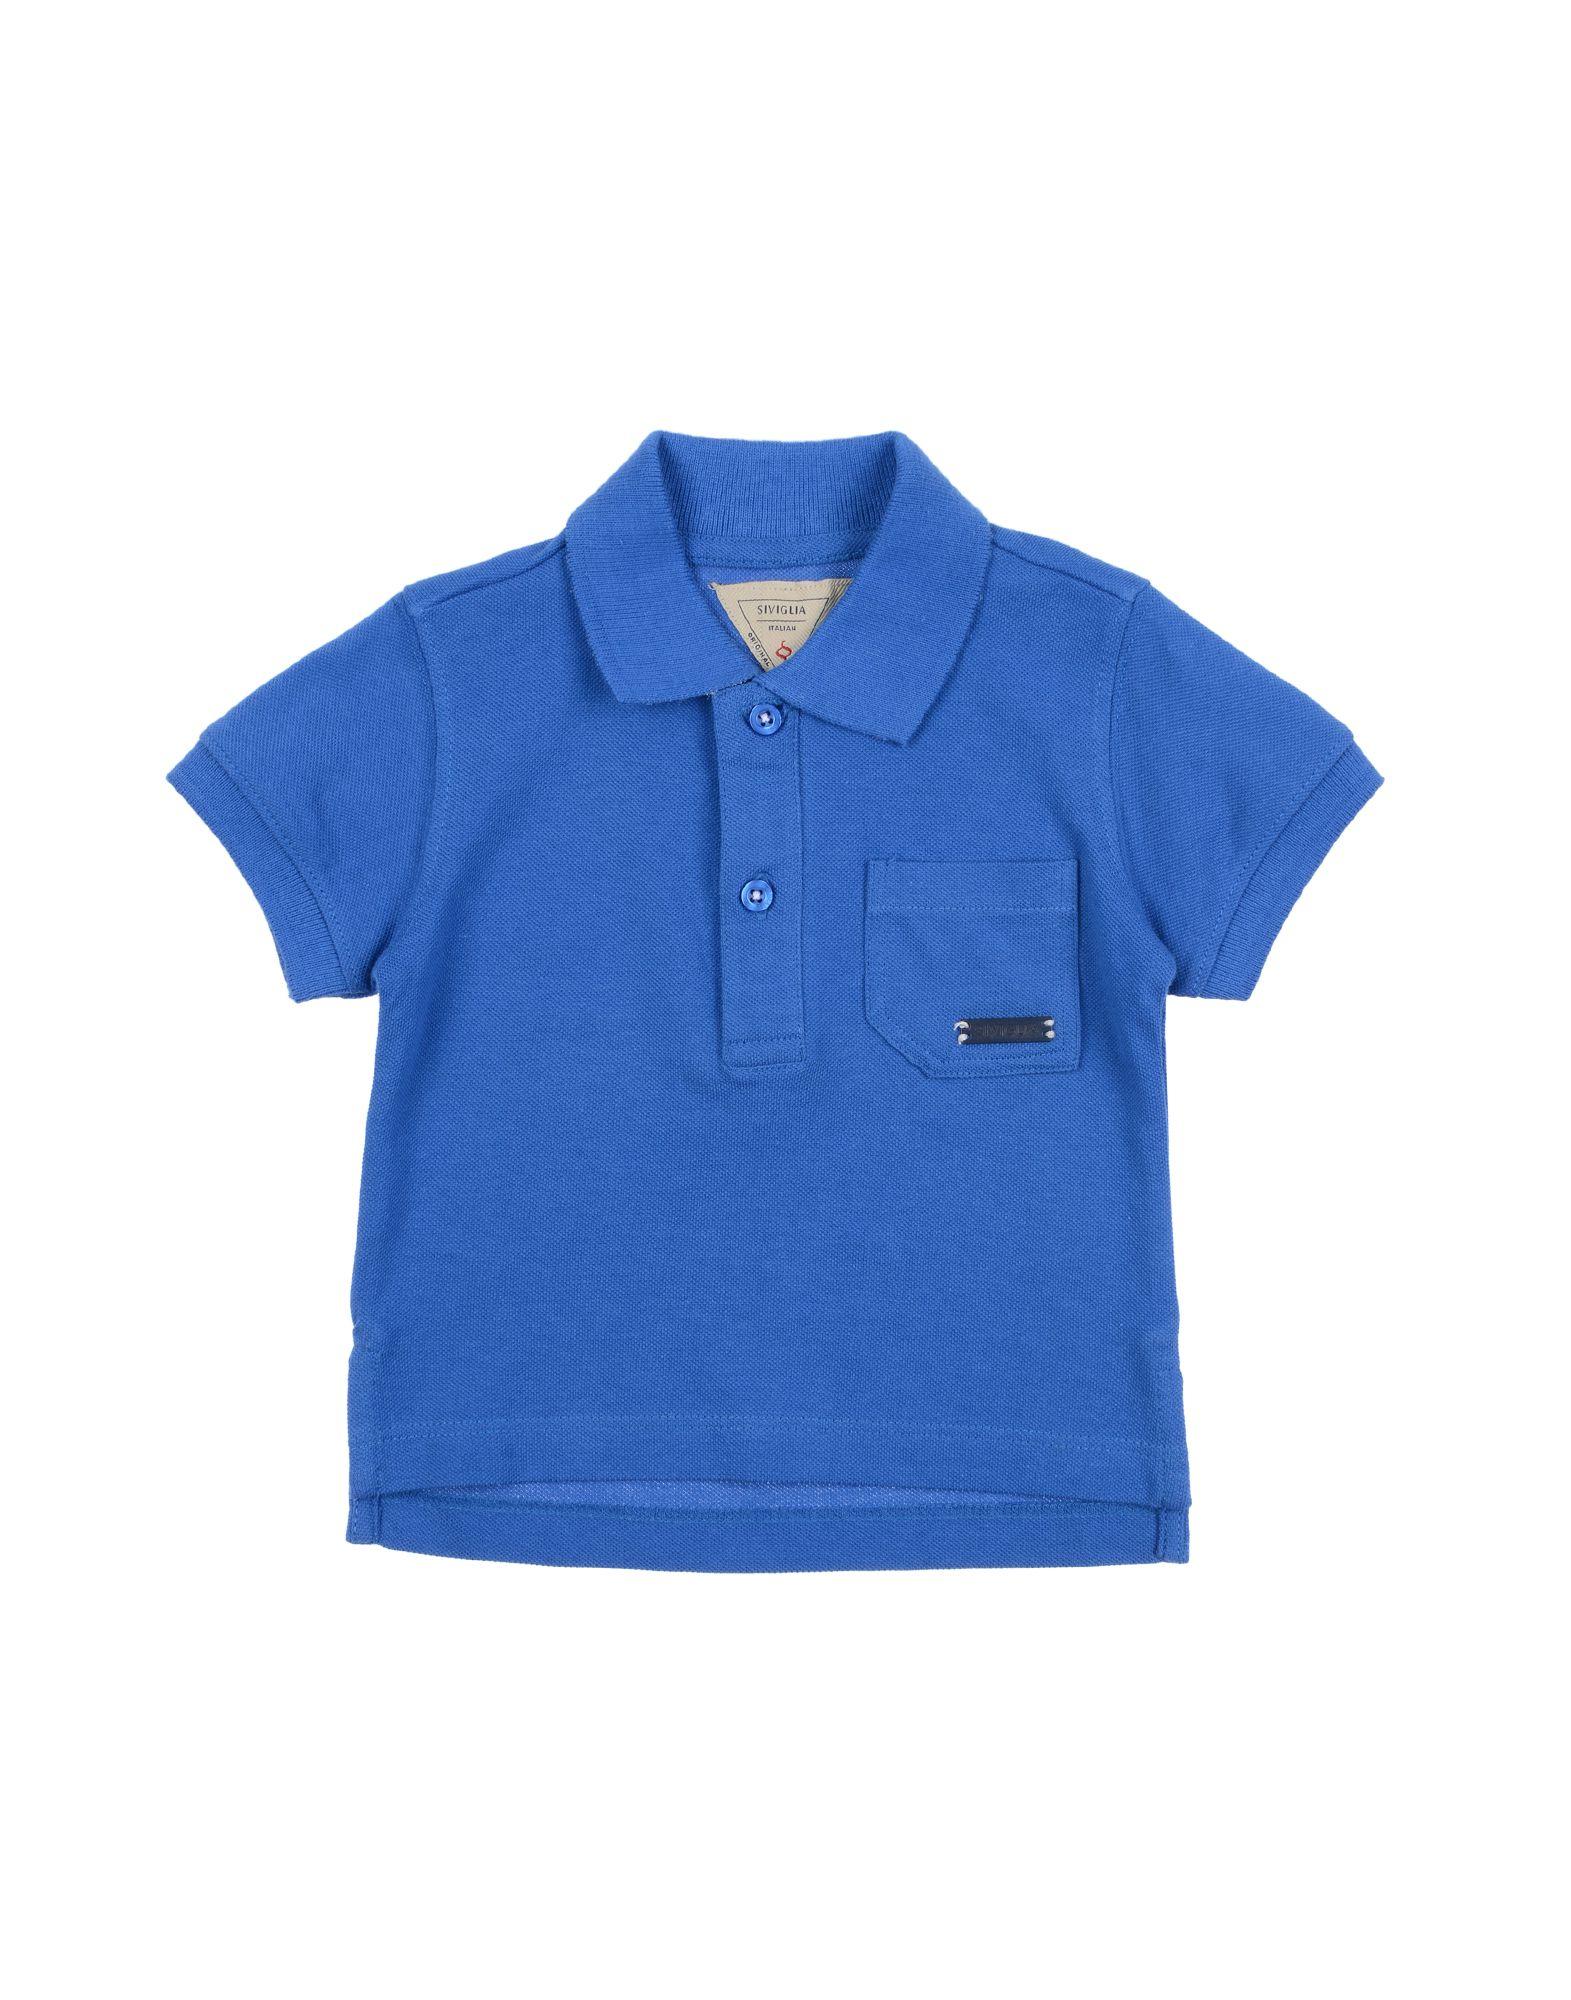 Siviglia Kids' Polo Shirts In Blue